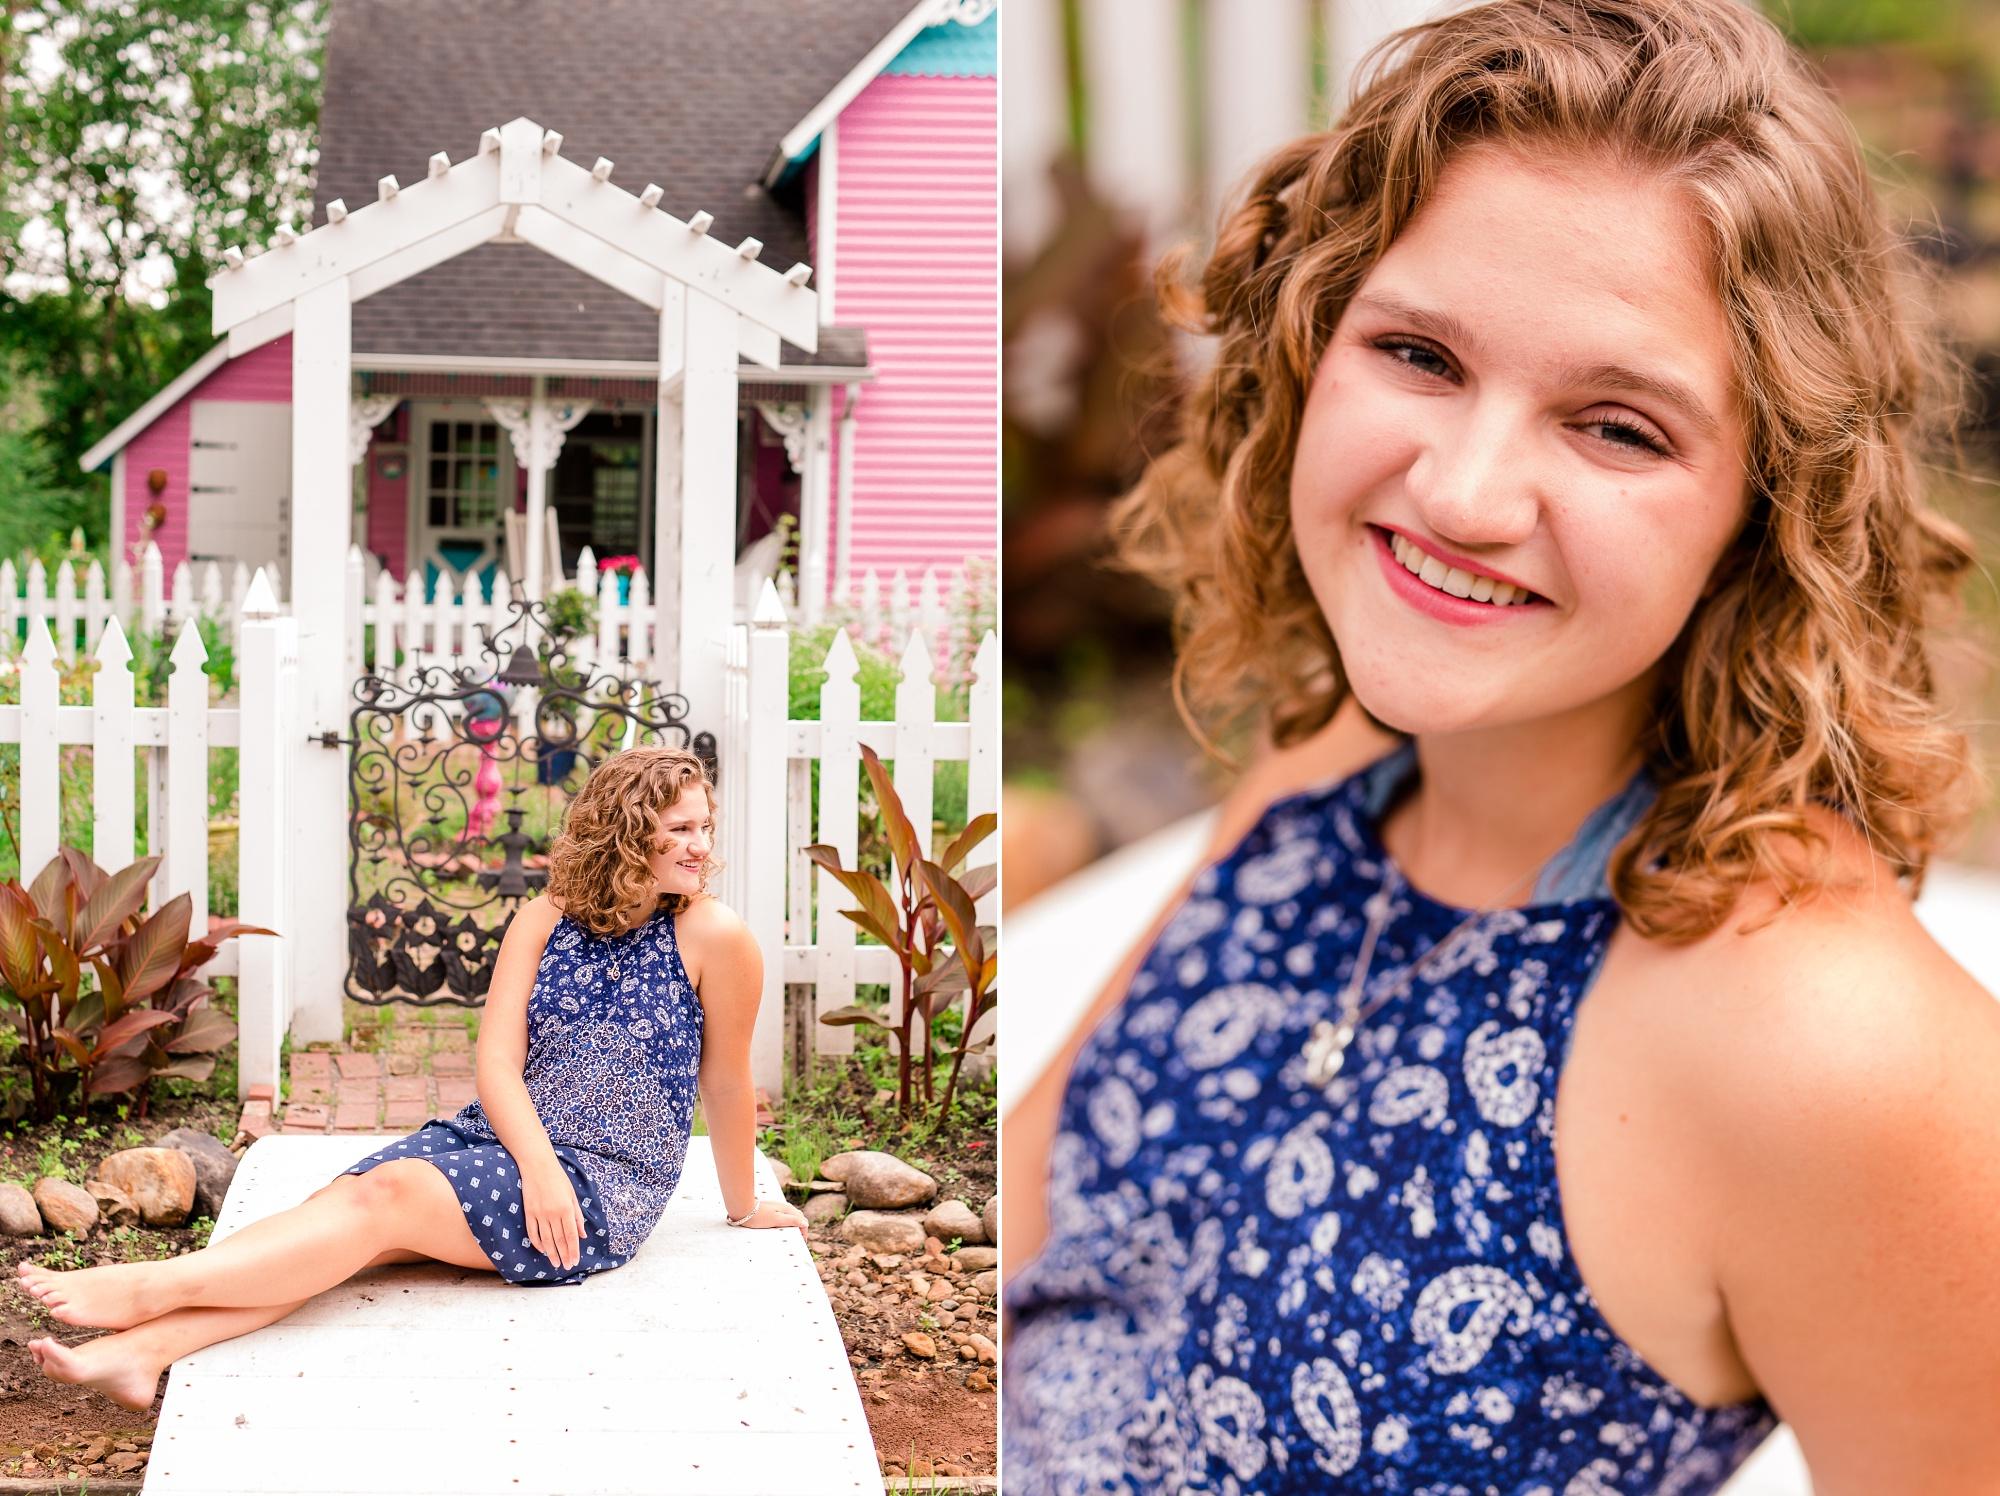 AmberLangerudPhotography_Lakeside Senior Pictures_2773.jpg